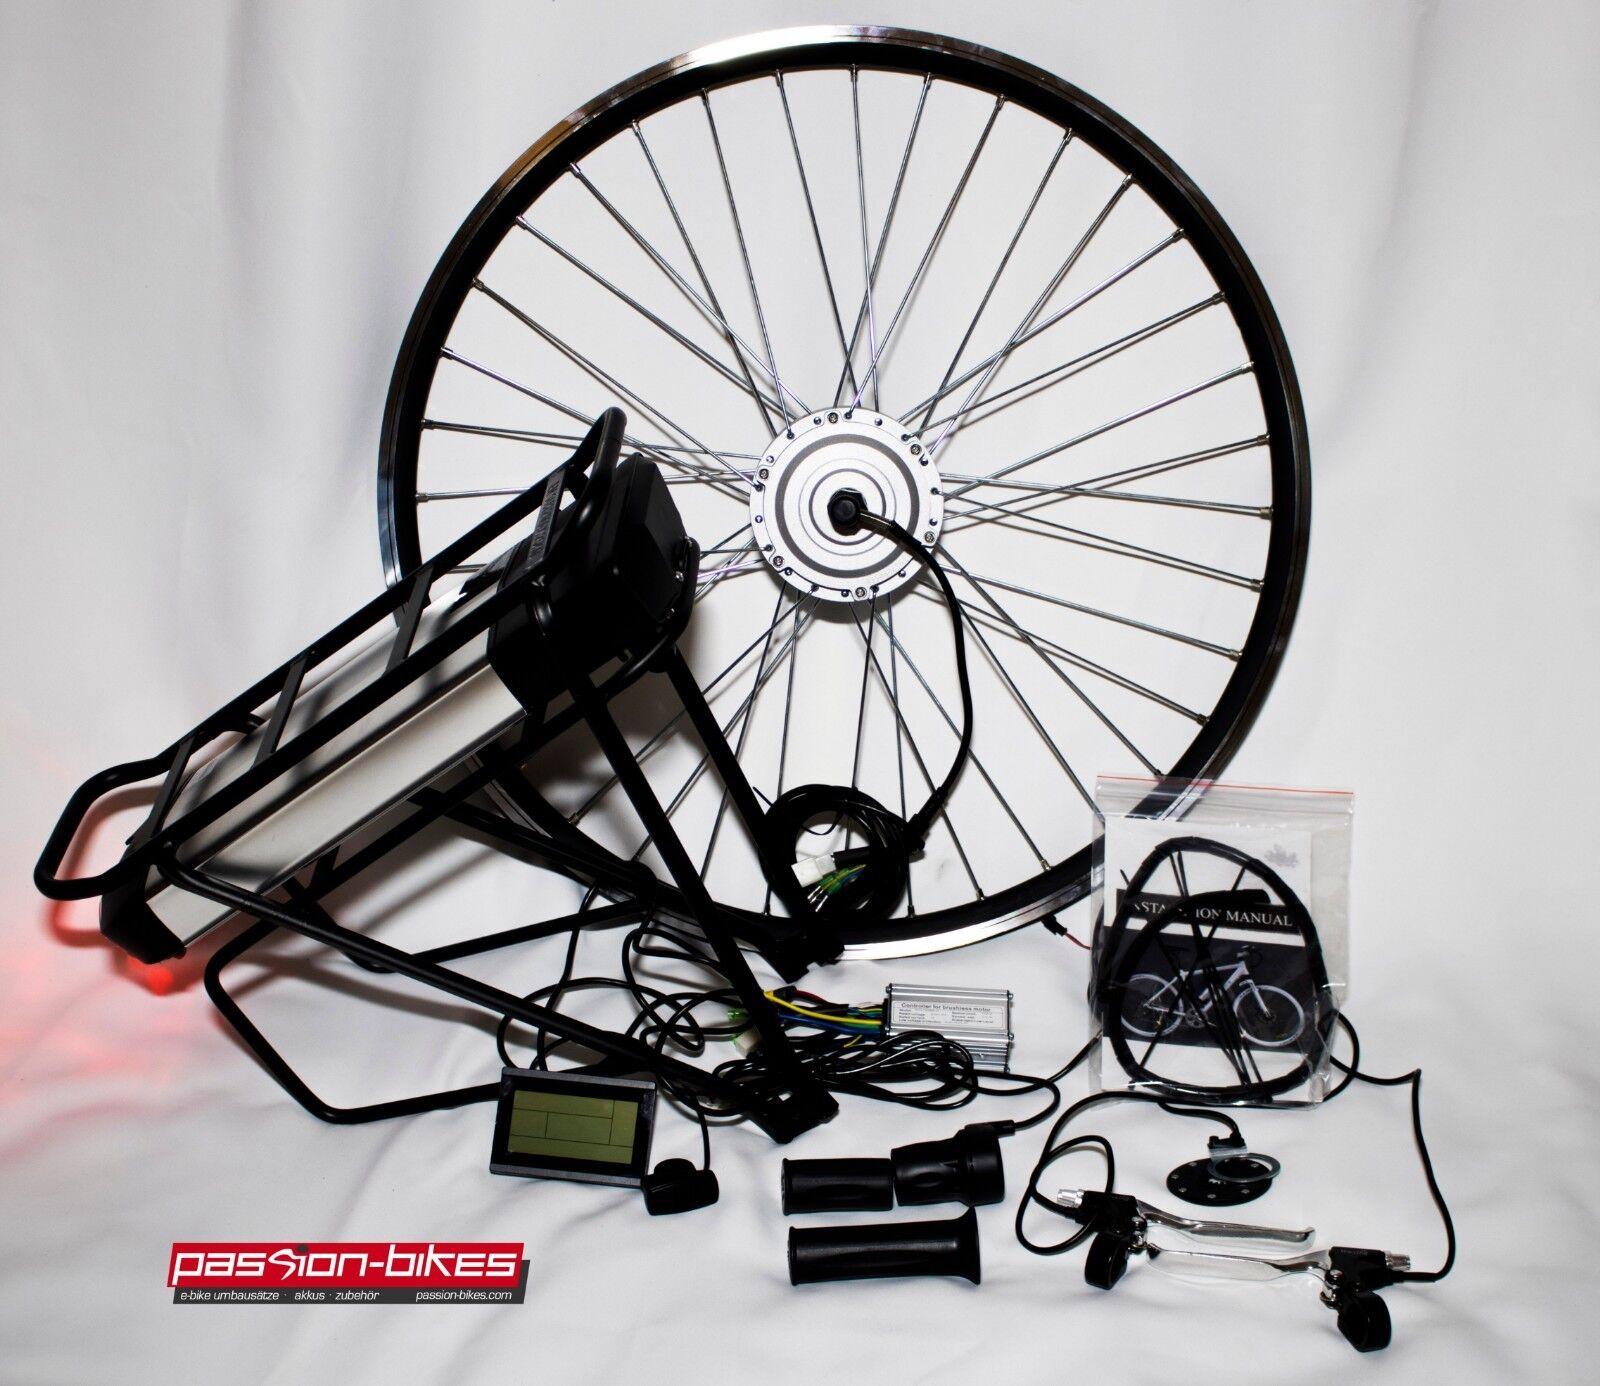 E-bike Pedelec  250 W Front completo conjunto de transformación kit  portaequipajes bateria 36v